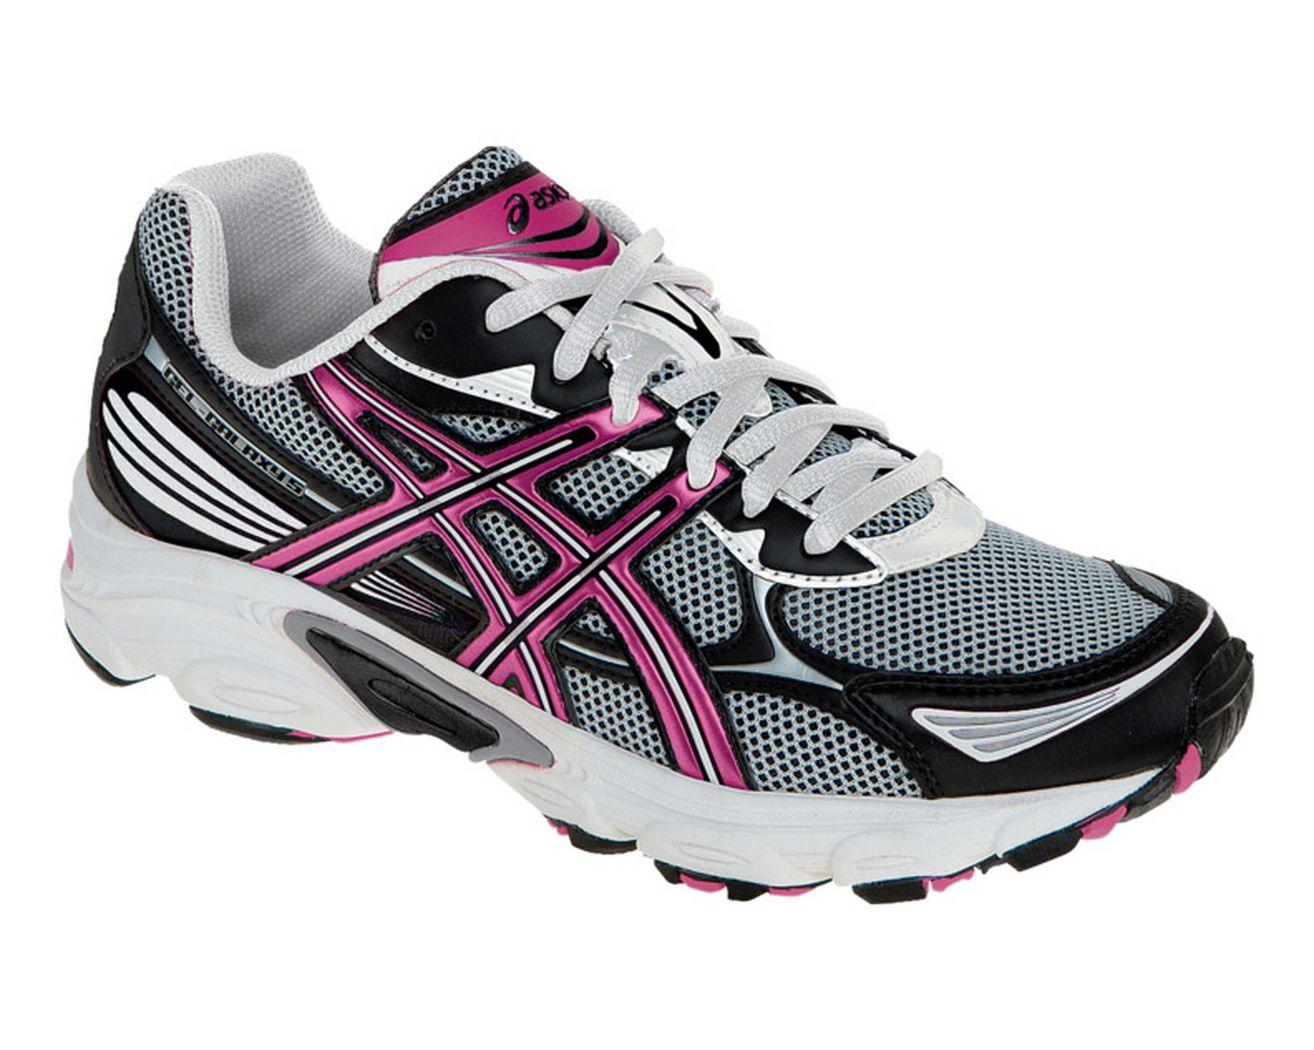 Best Womens Running Shoes For Beginners Uk